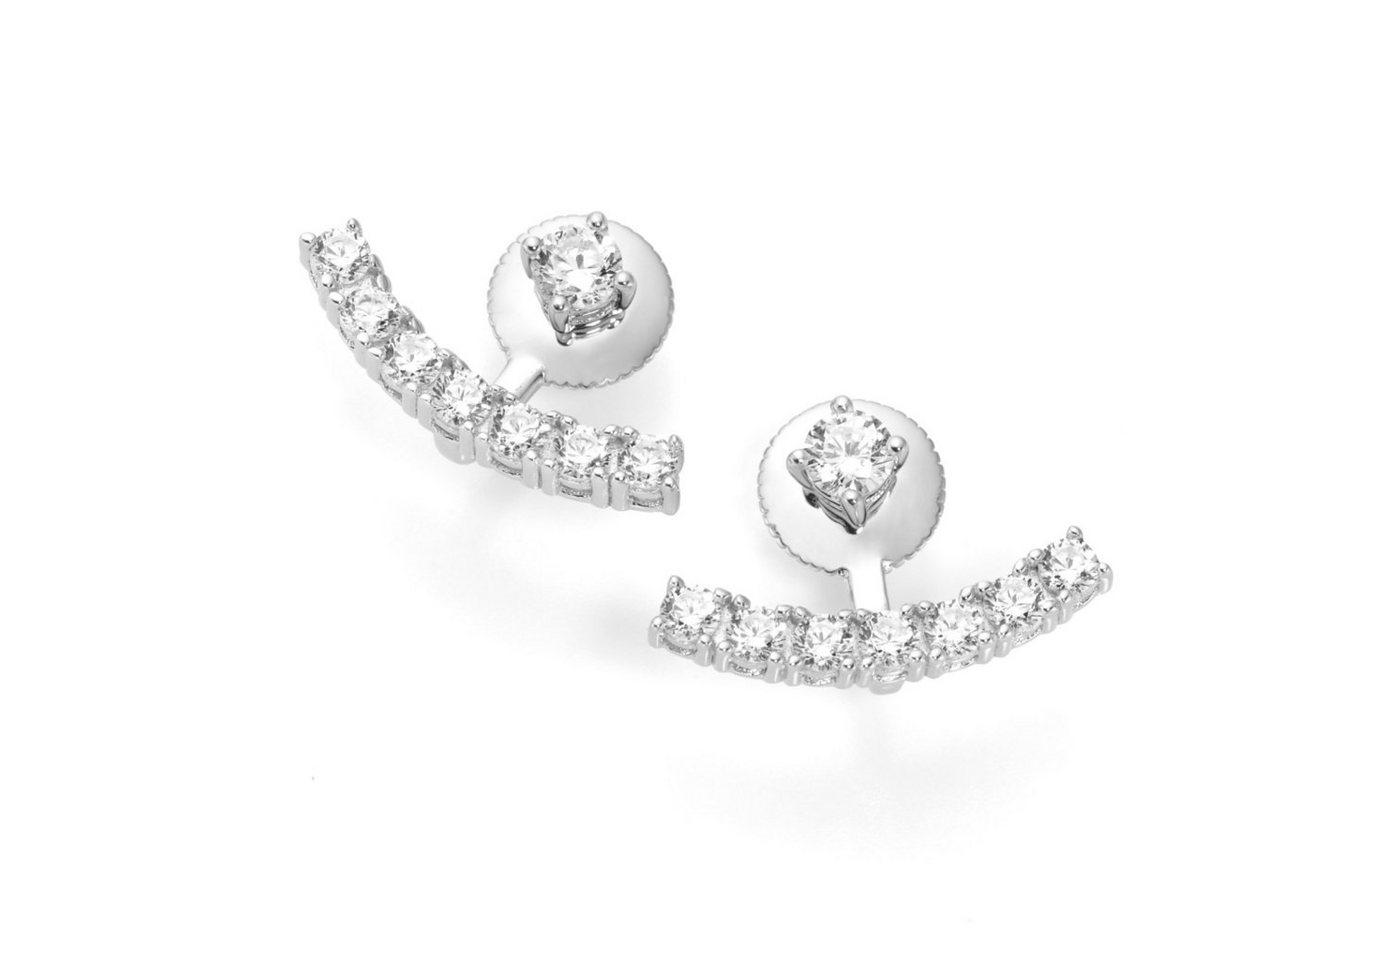 Smart Jewel Paar Ohrstecker »2-teilig mit Zirkonia Steinen«   Schmuck > Ohrschmuck & Ohrringe > Ohrstecker   Weiß   Smart Jewel